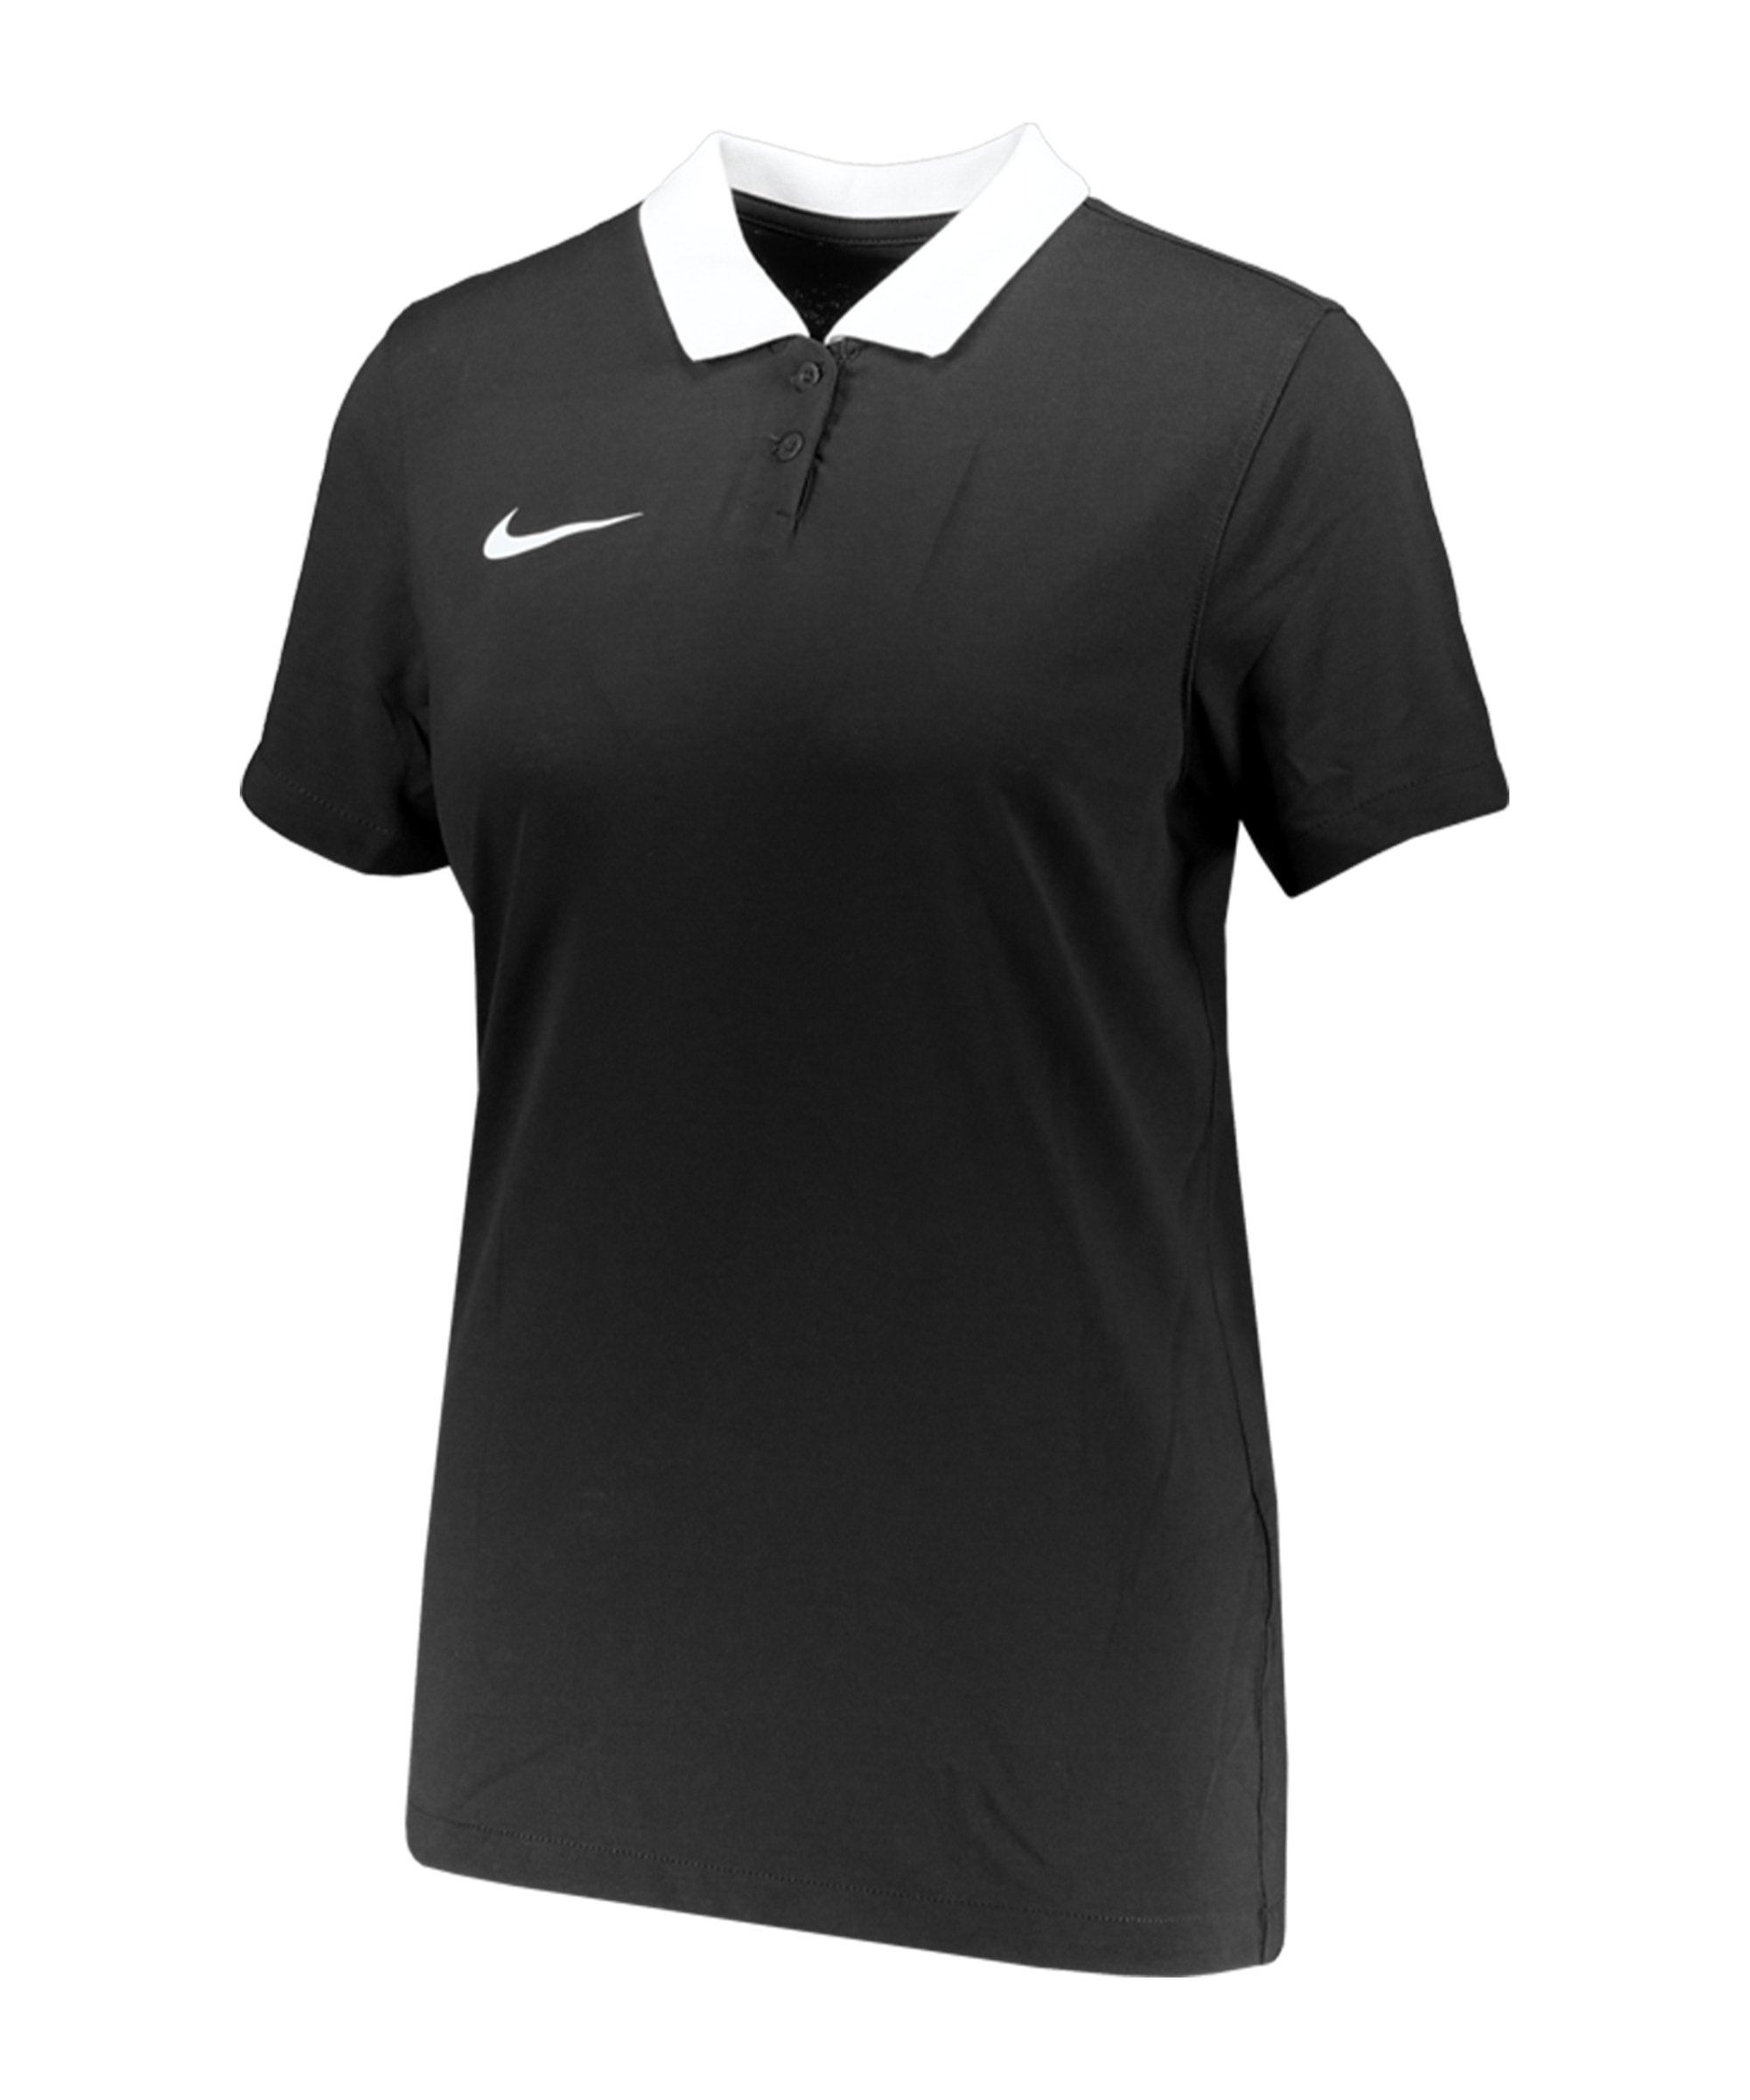 Nike Park 20 Poloshirt Damen Schwarz Weiss F010 - schwarz